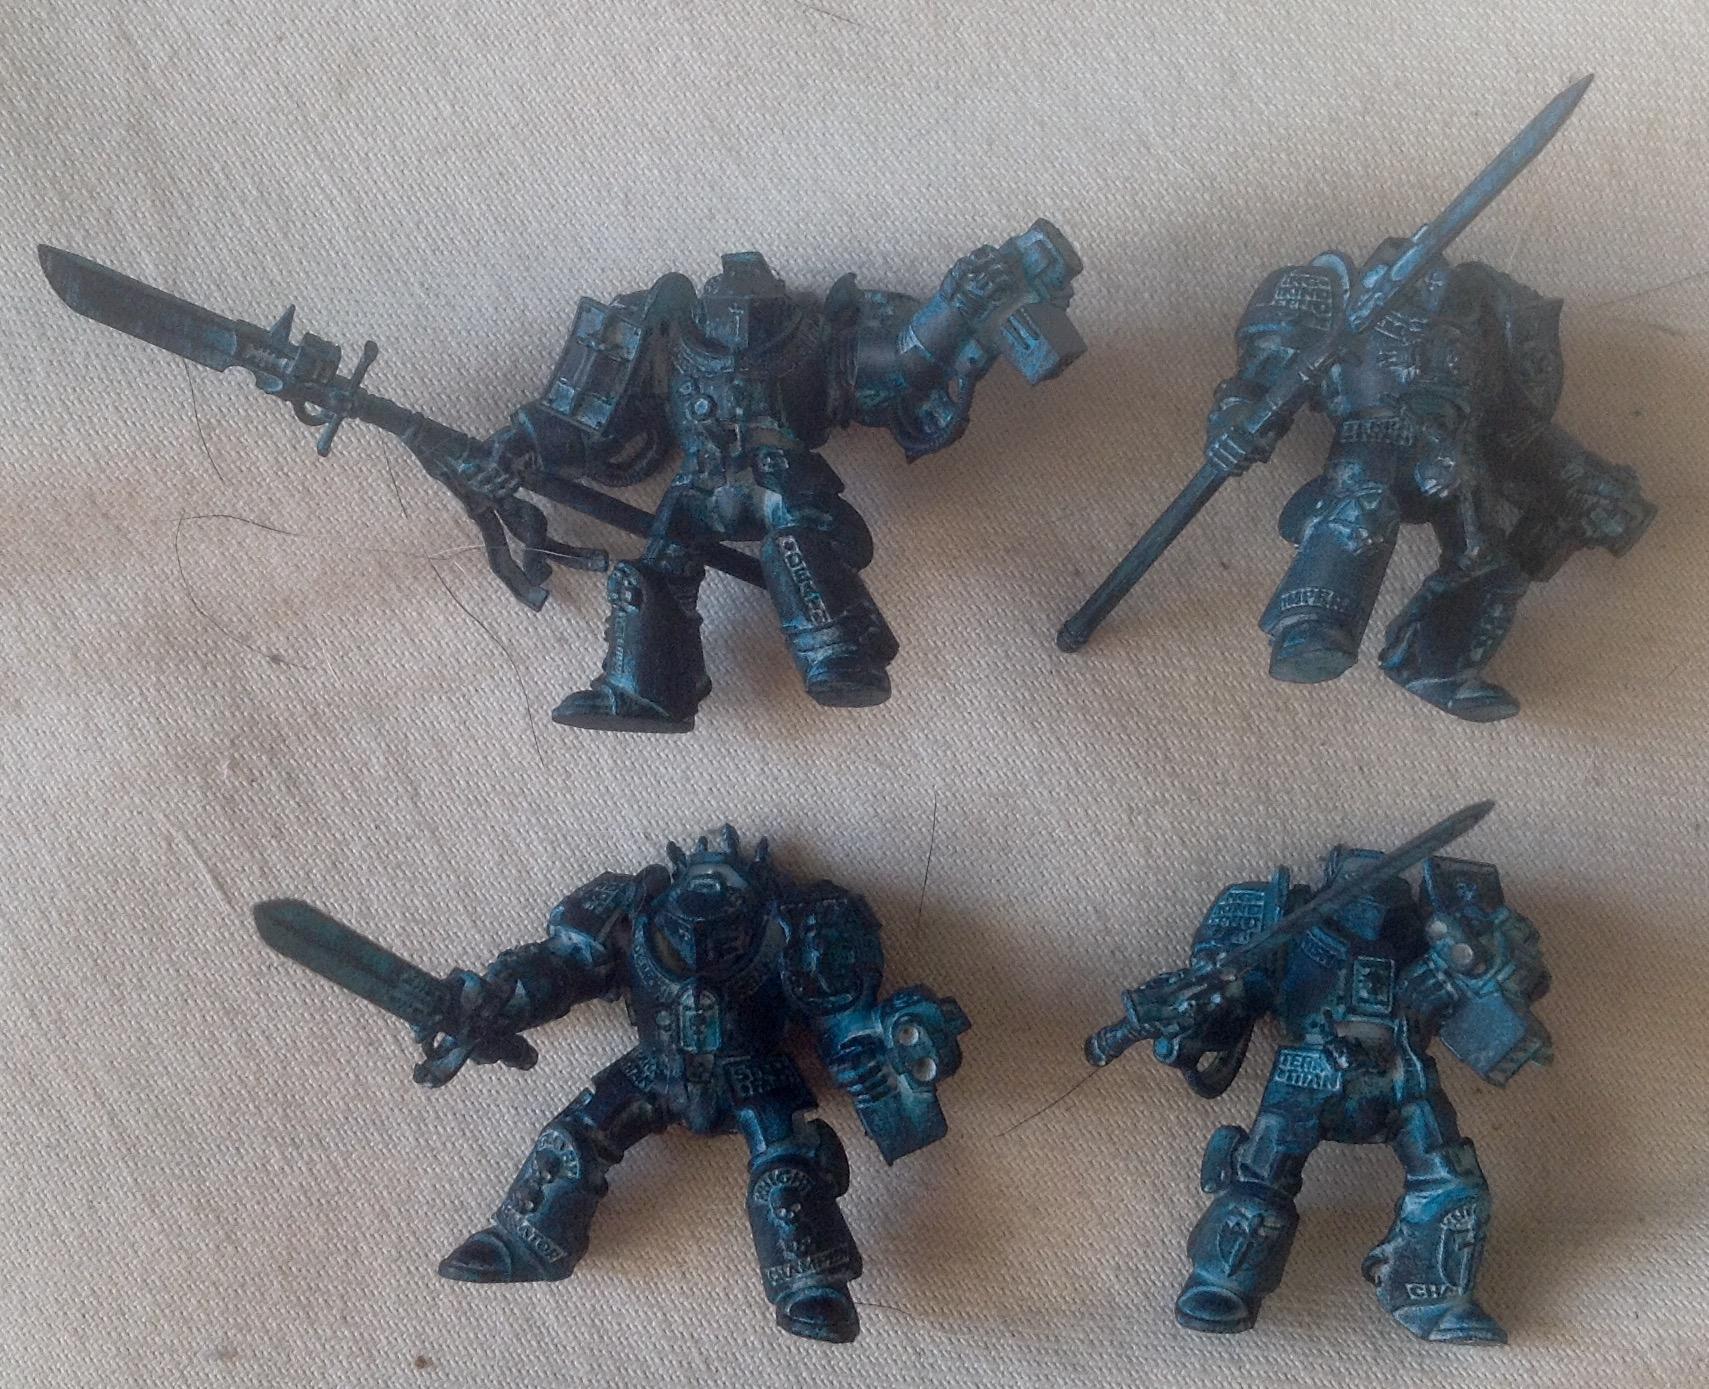 Grey Knights, Terminator Armor, Warhammer 40,000, Work In Progress